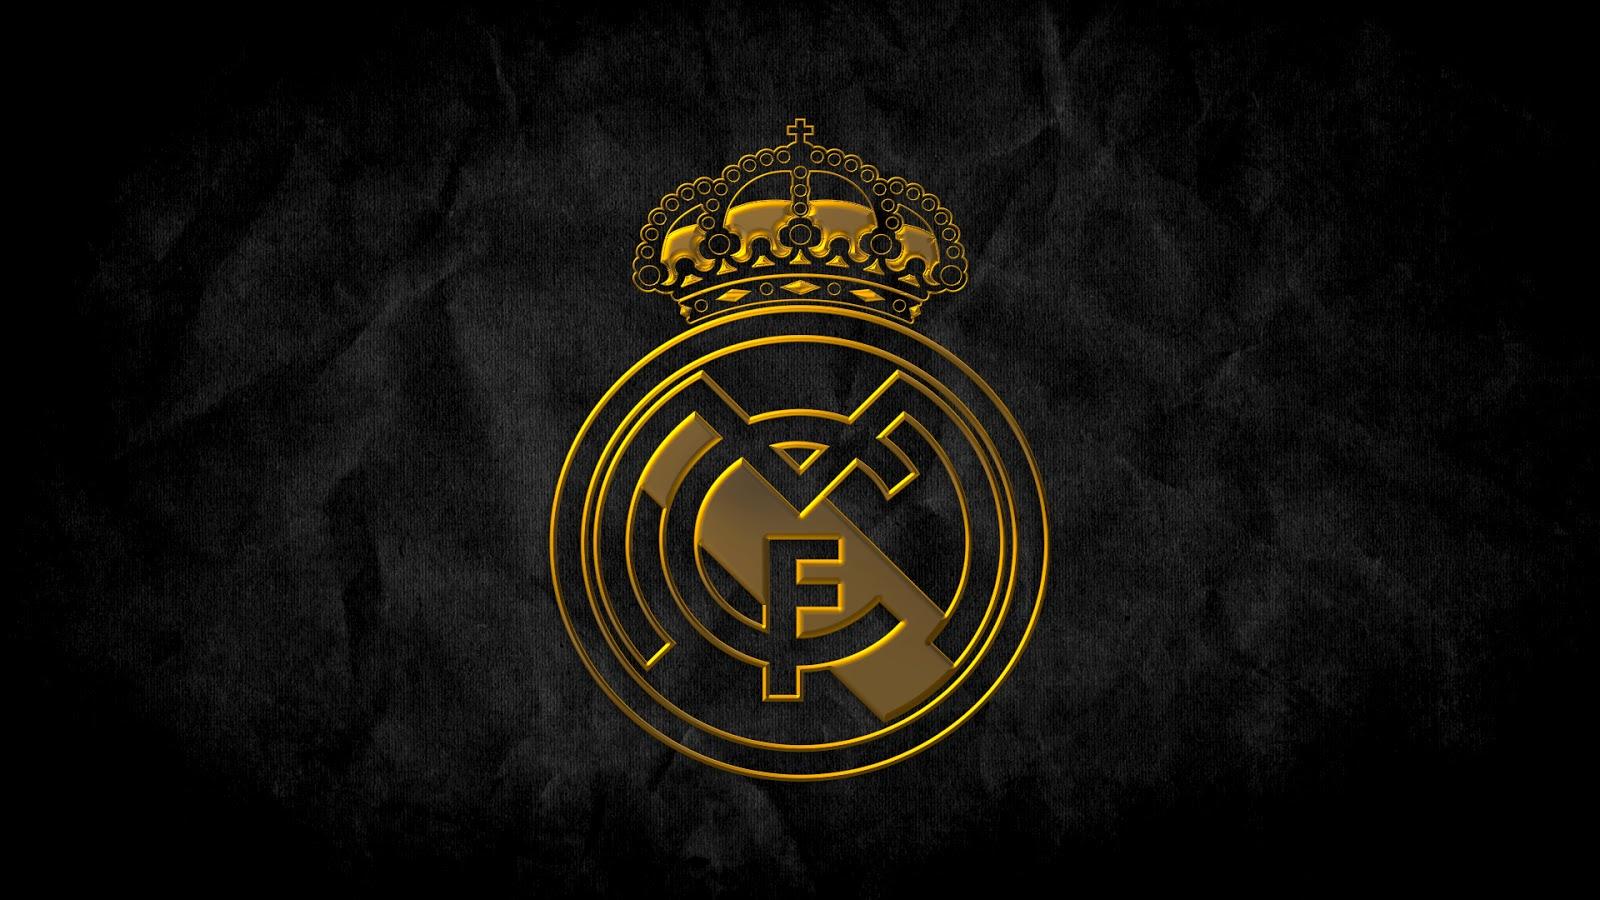 Реал Мадрид на Sportsru все новости состав календарь интервью фото и видео История и форма